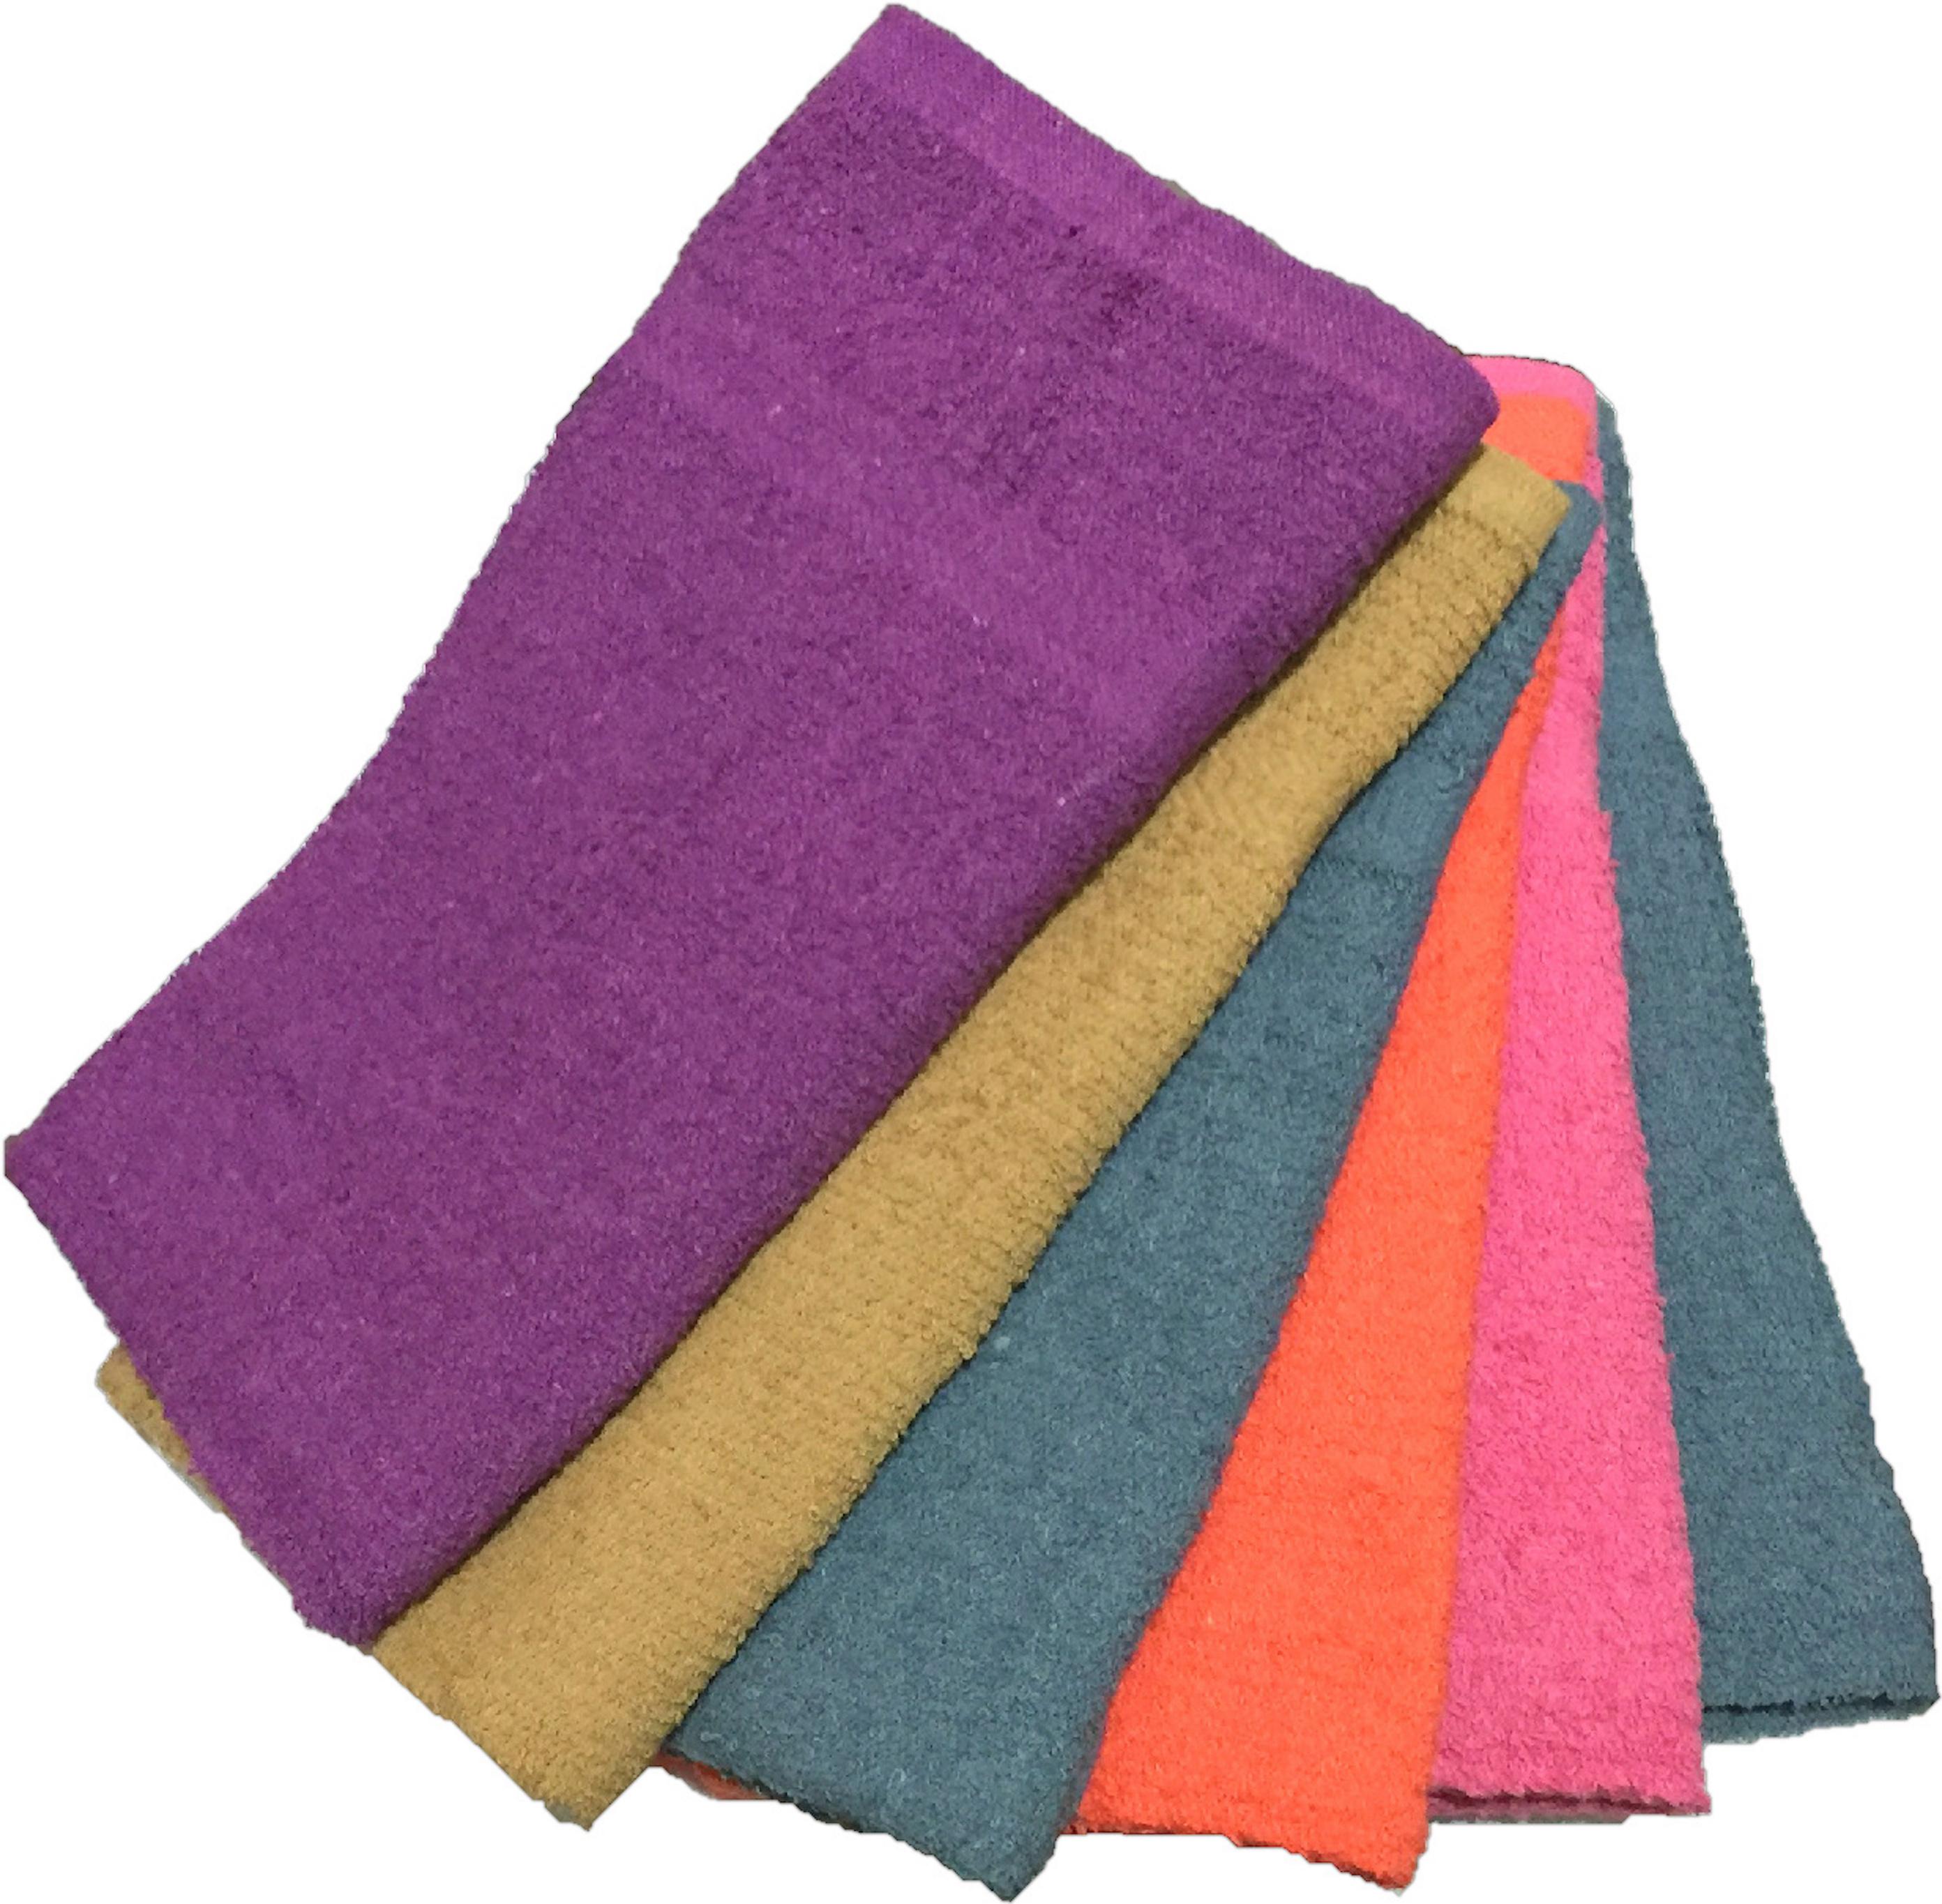 Budget Tea Towels 100% Cotton